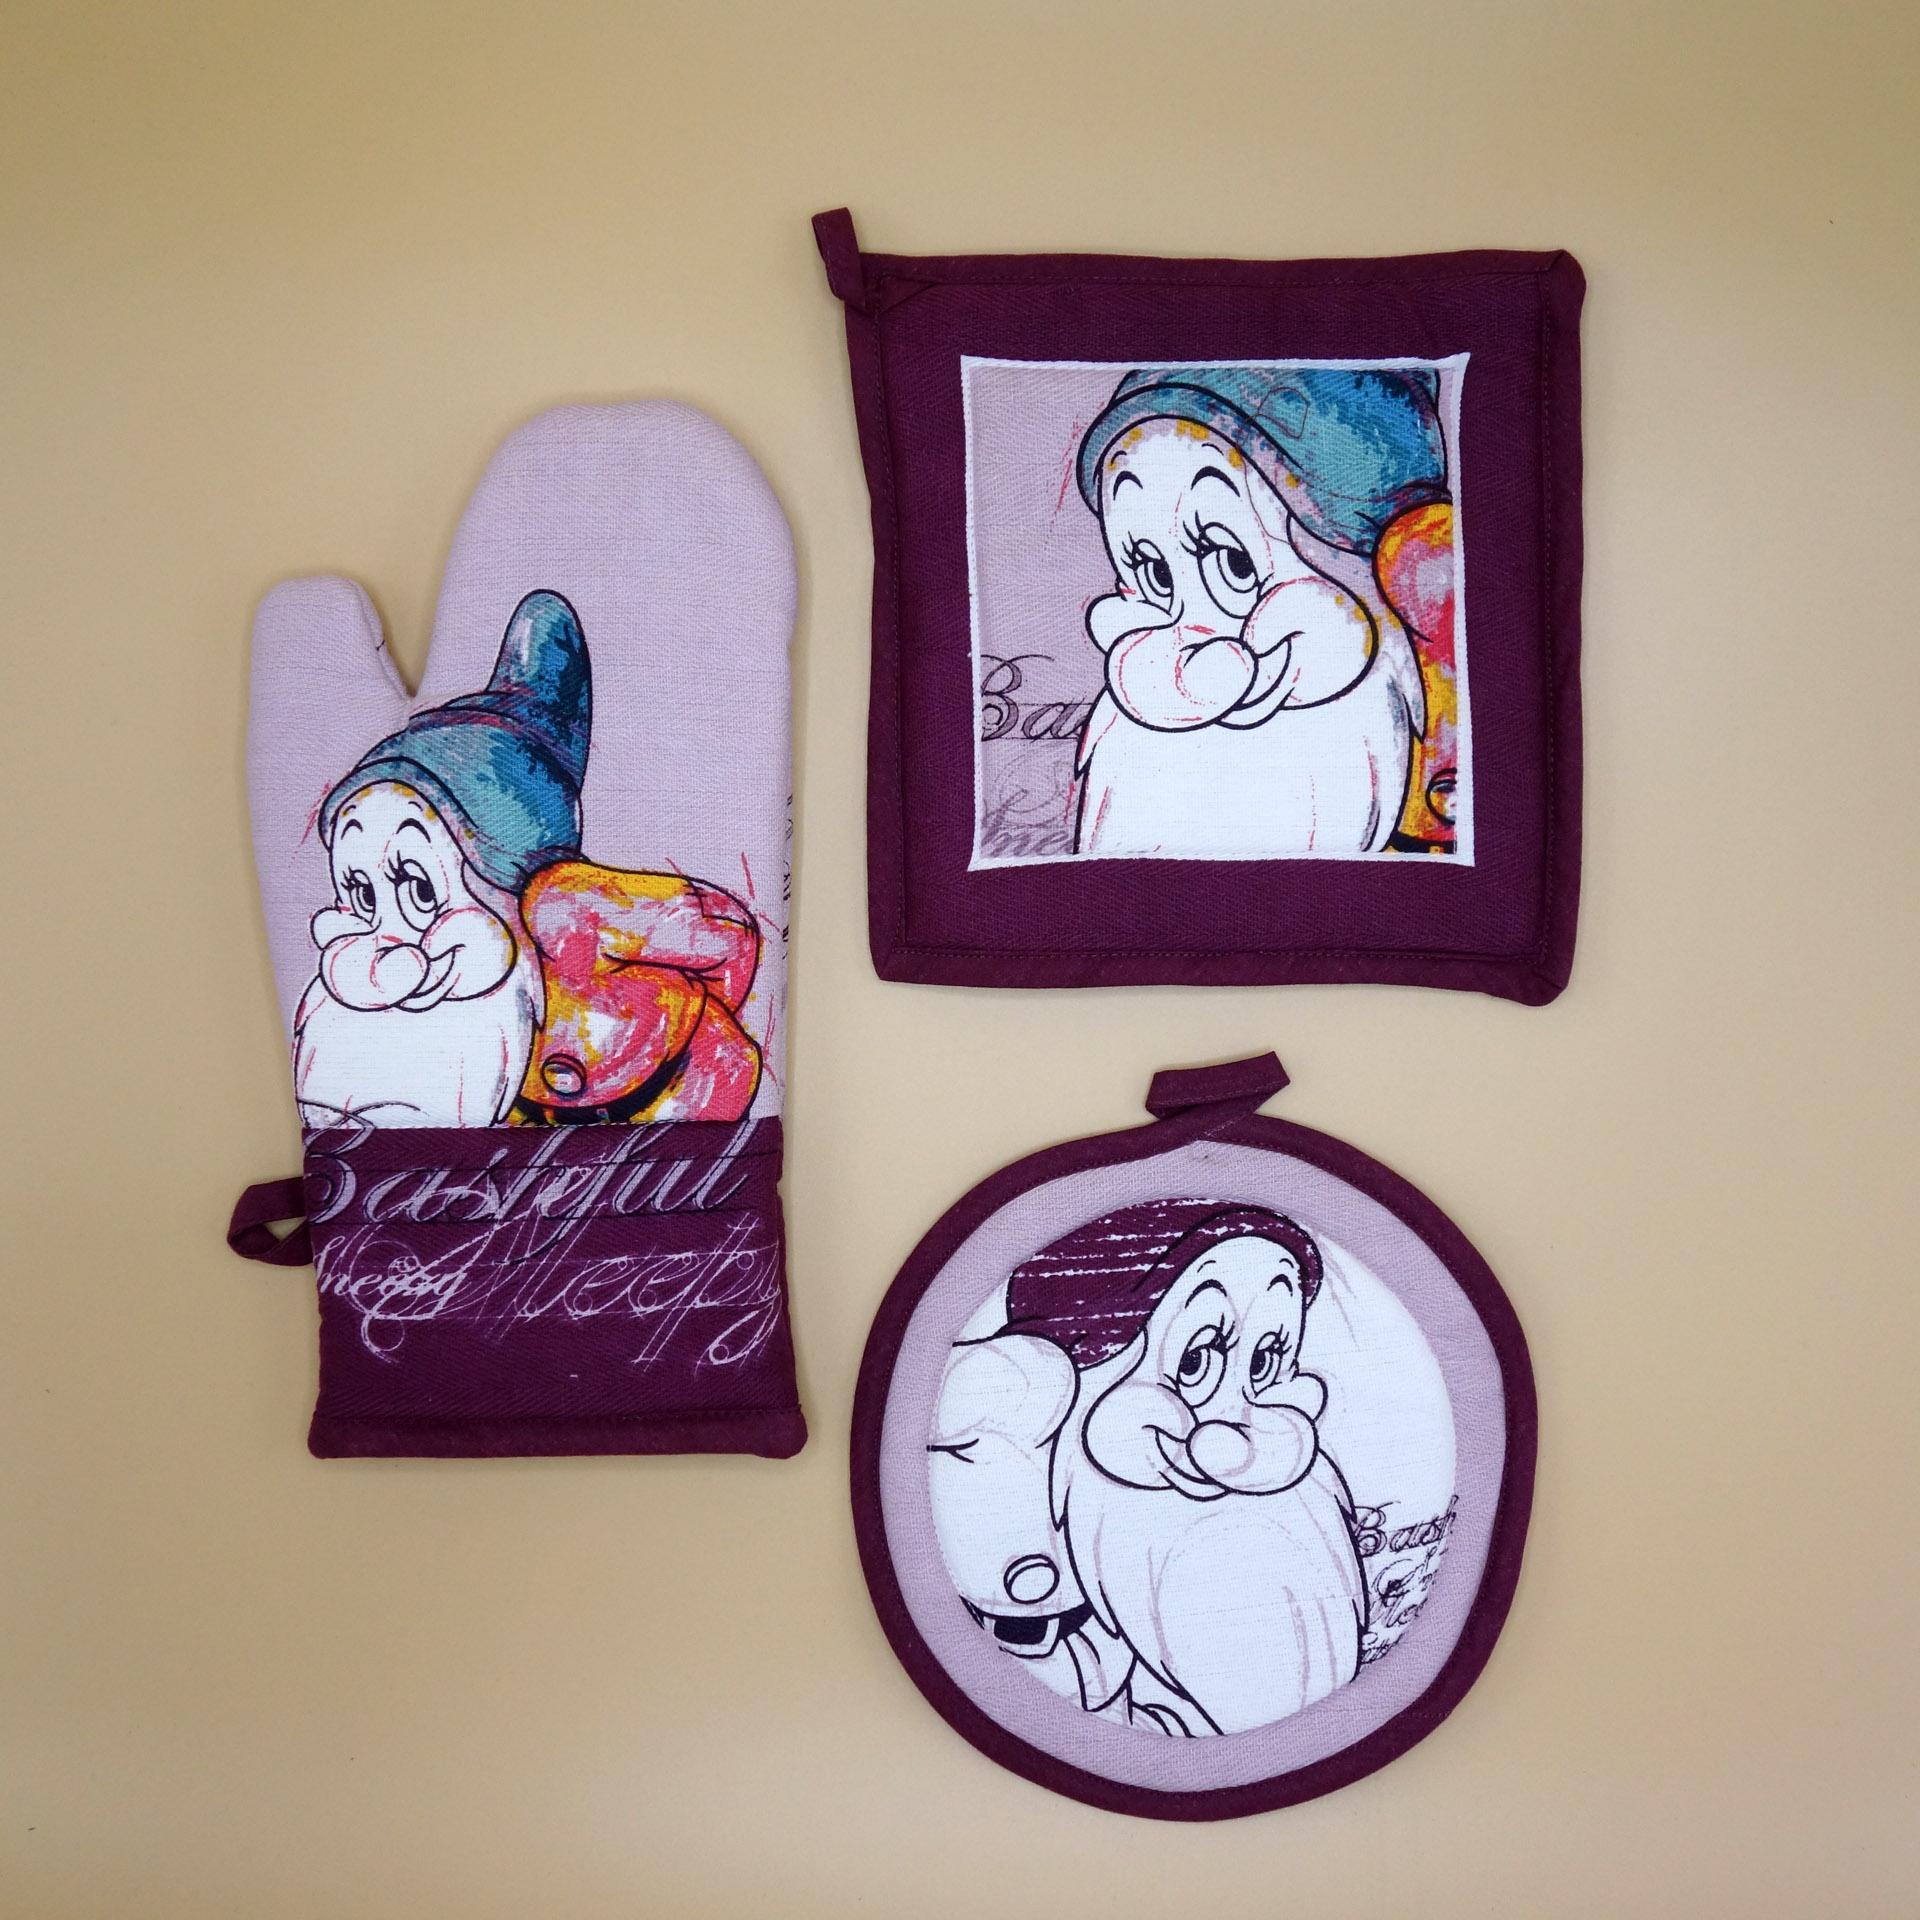 Egan Disney 3-er Set Topflappen Ofenhandschuhe 7 Zwerge Bashful